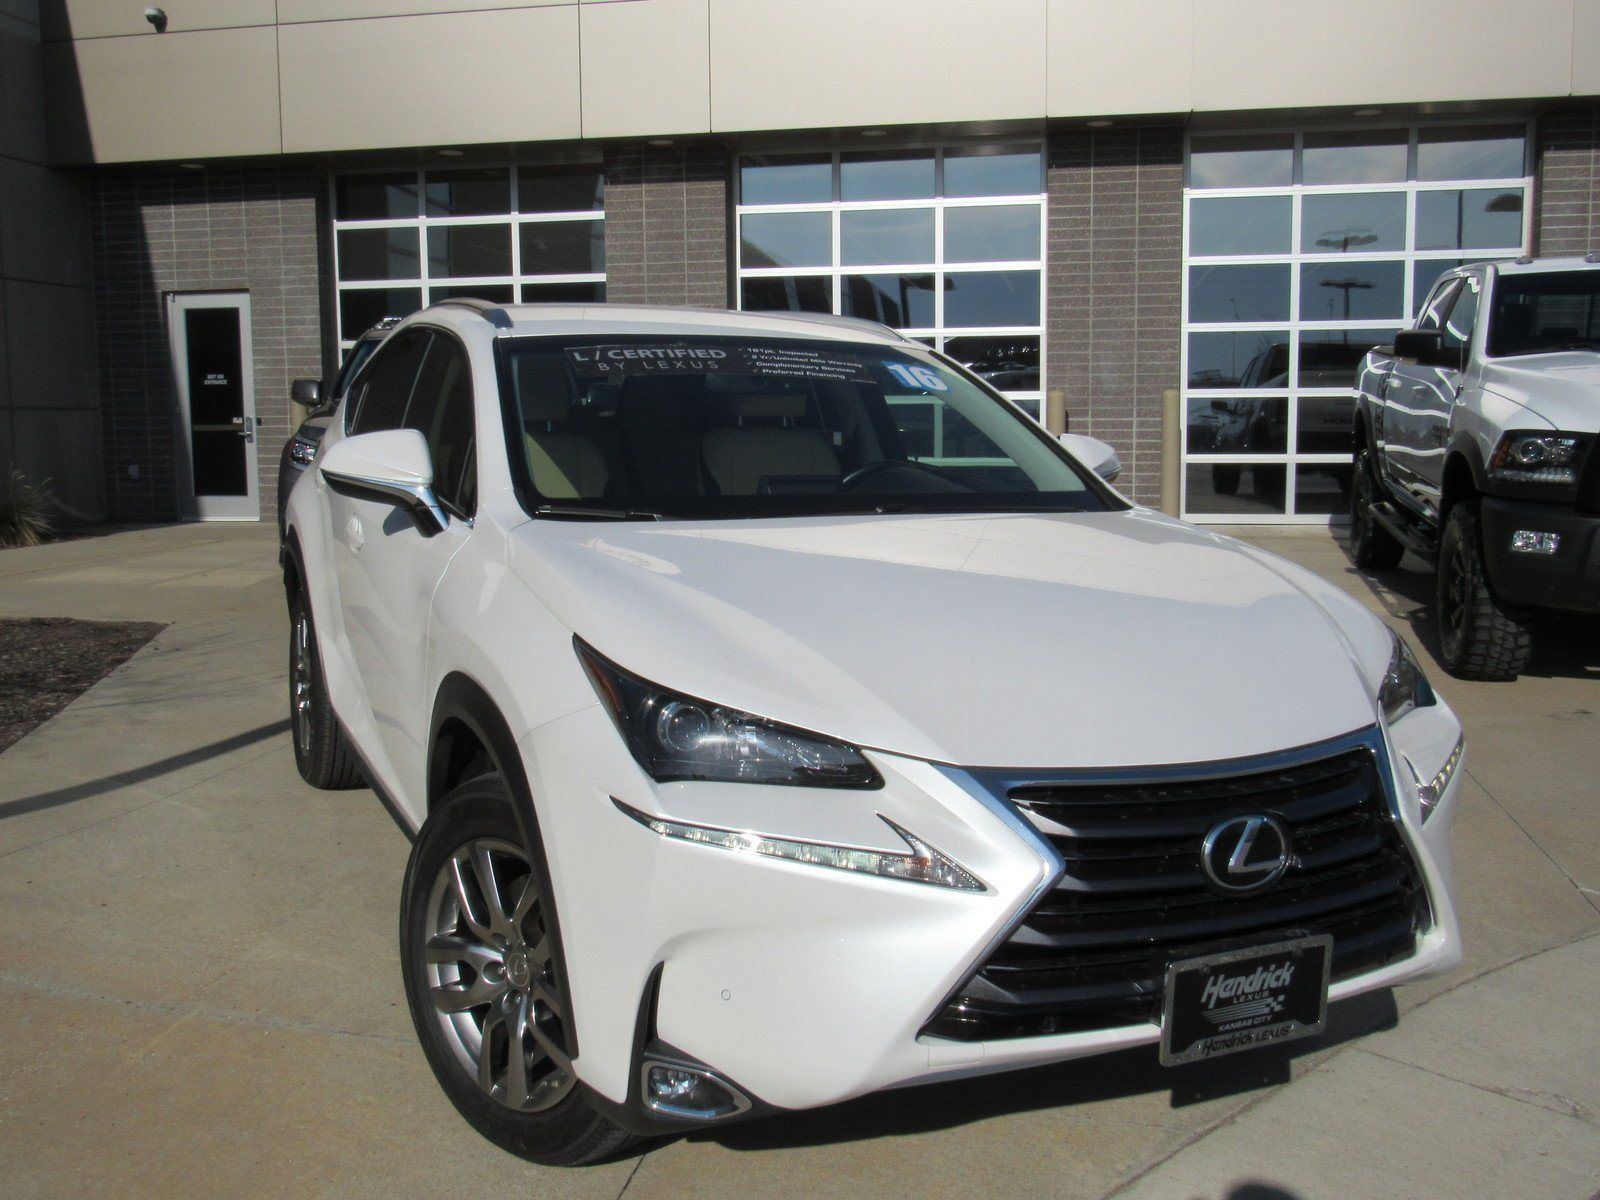 2021 Lexus Nx 200t Price and Review | Lexus nx 200t, Lexus ...